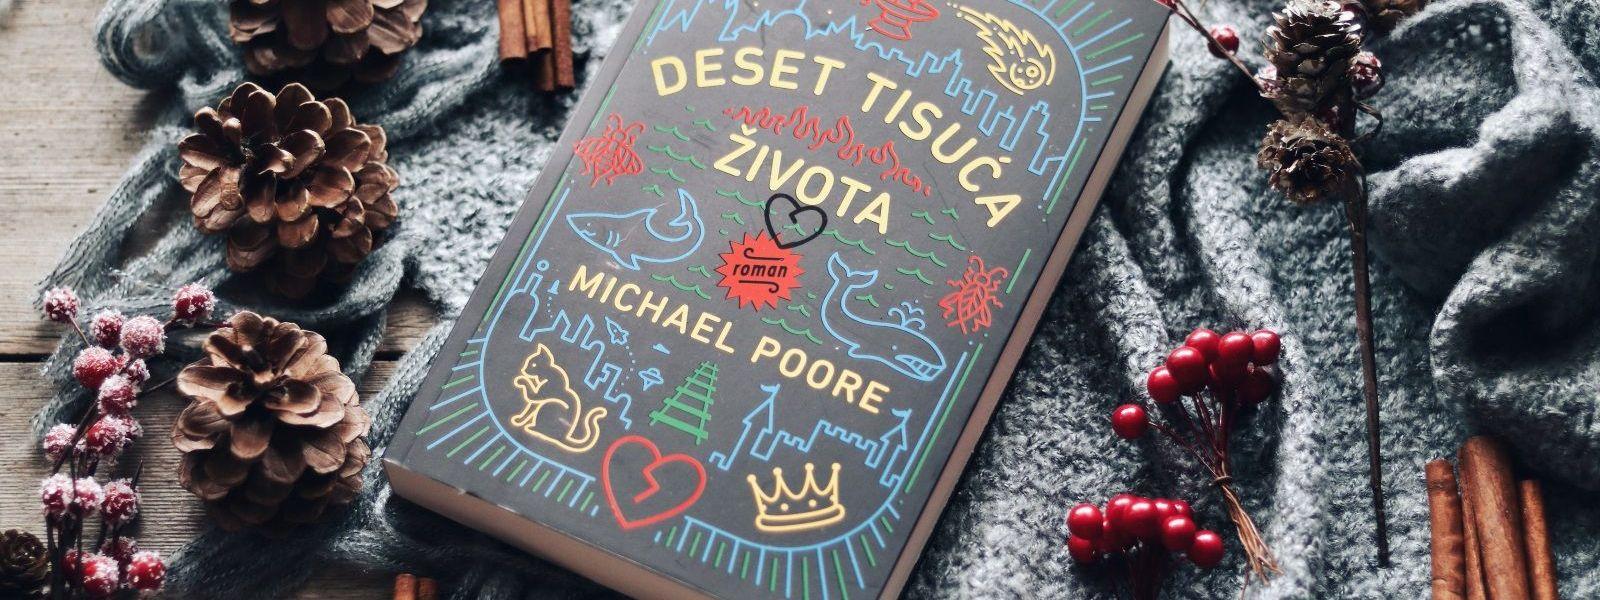 Deset tisuća života (Michael Poore)